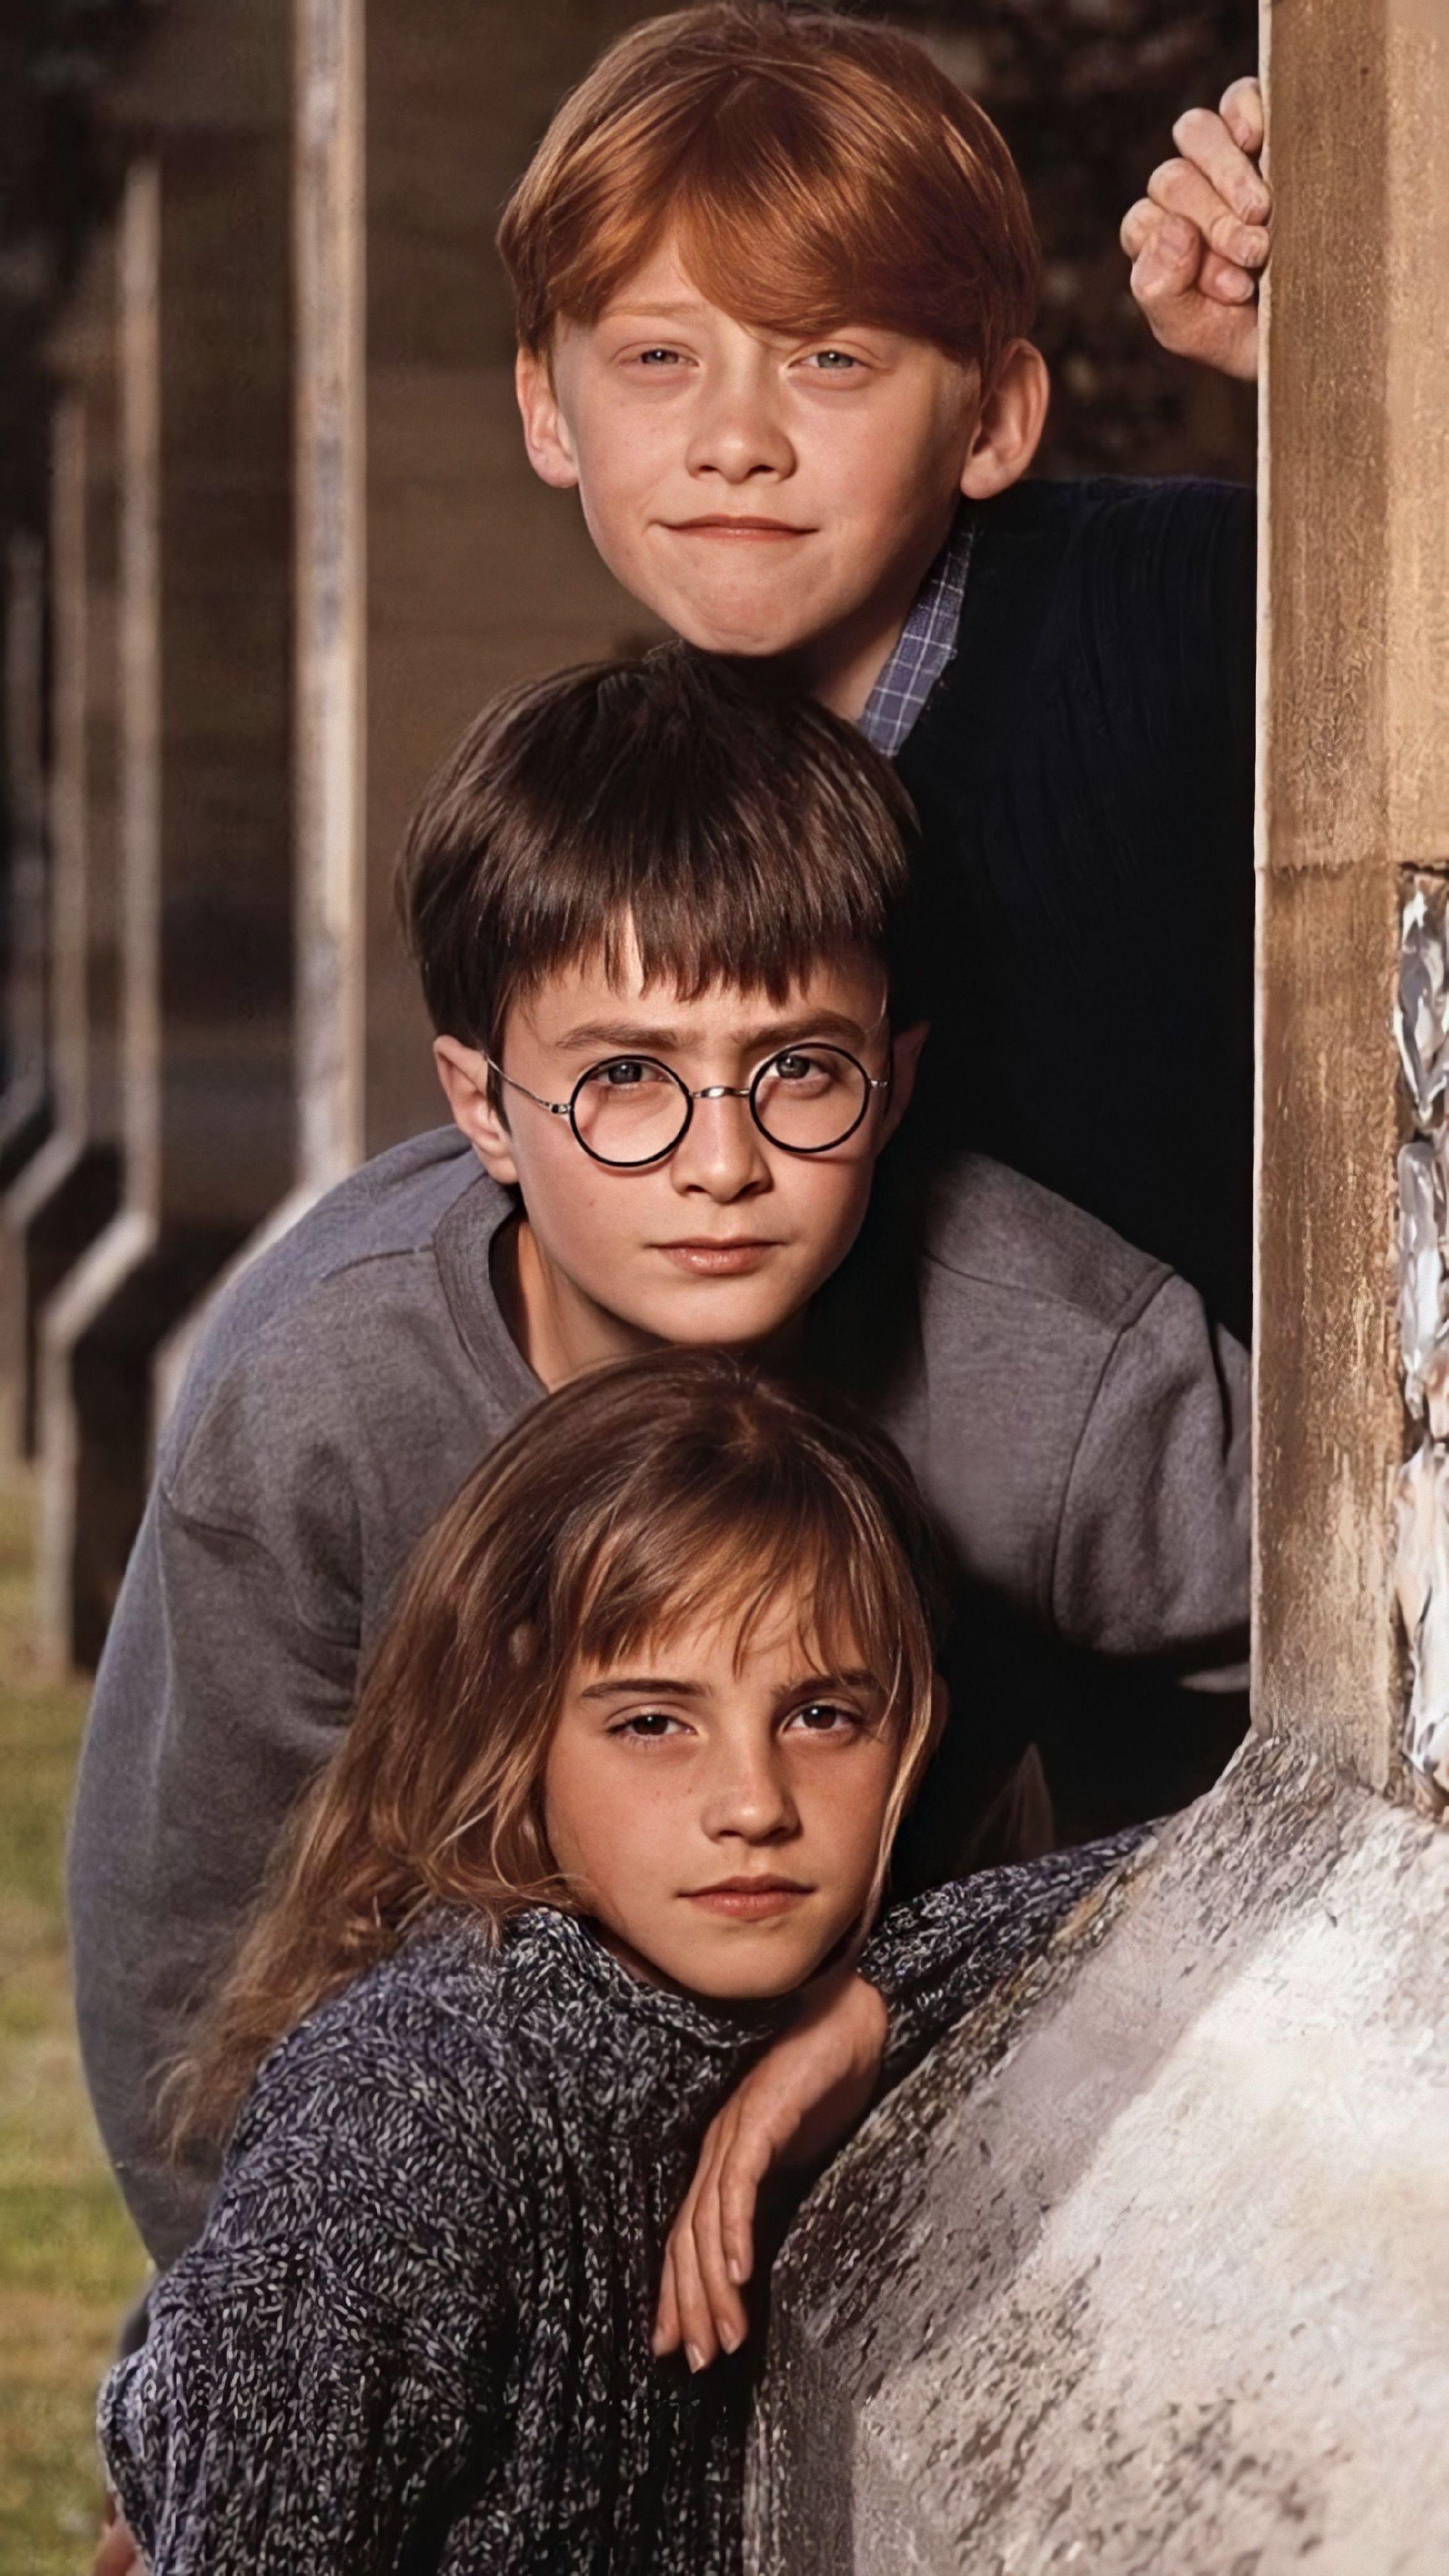 Ron Weasley, Harry Potter and Hermonie Granger. [3840 x 2160]